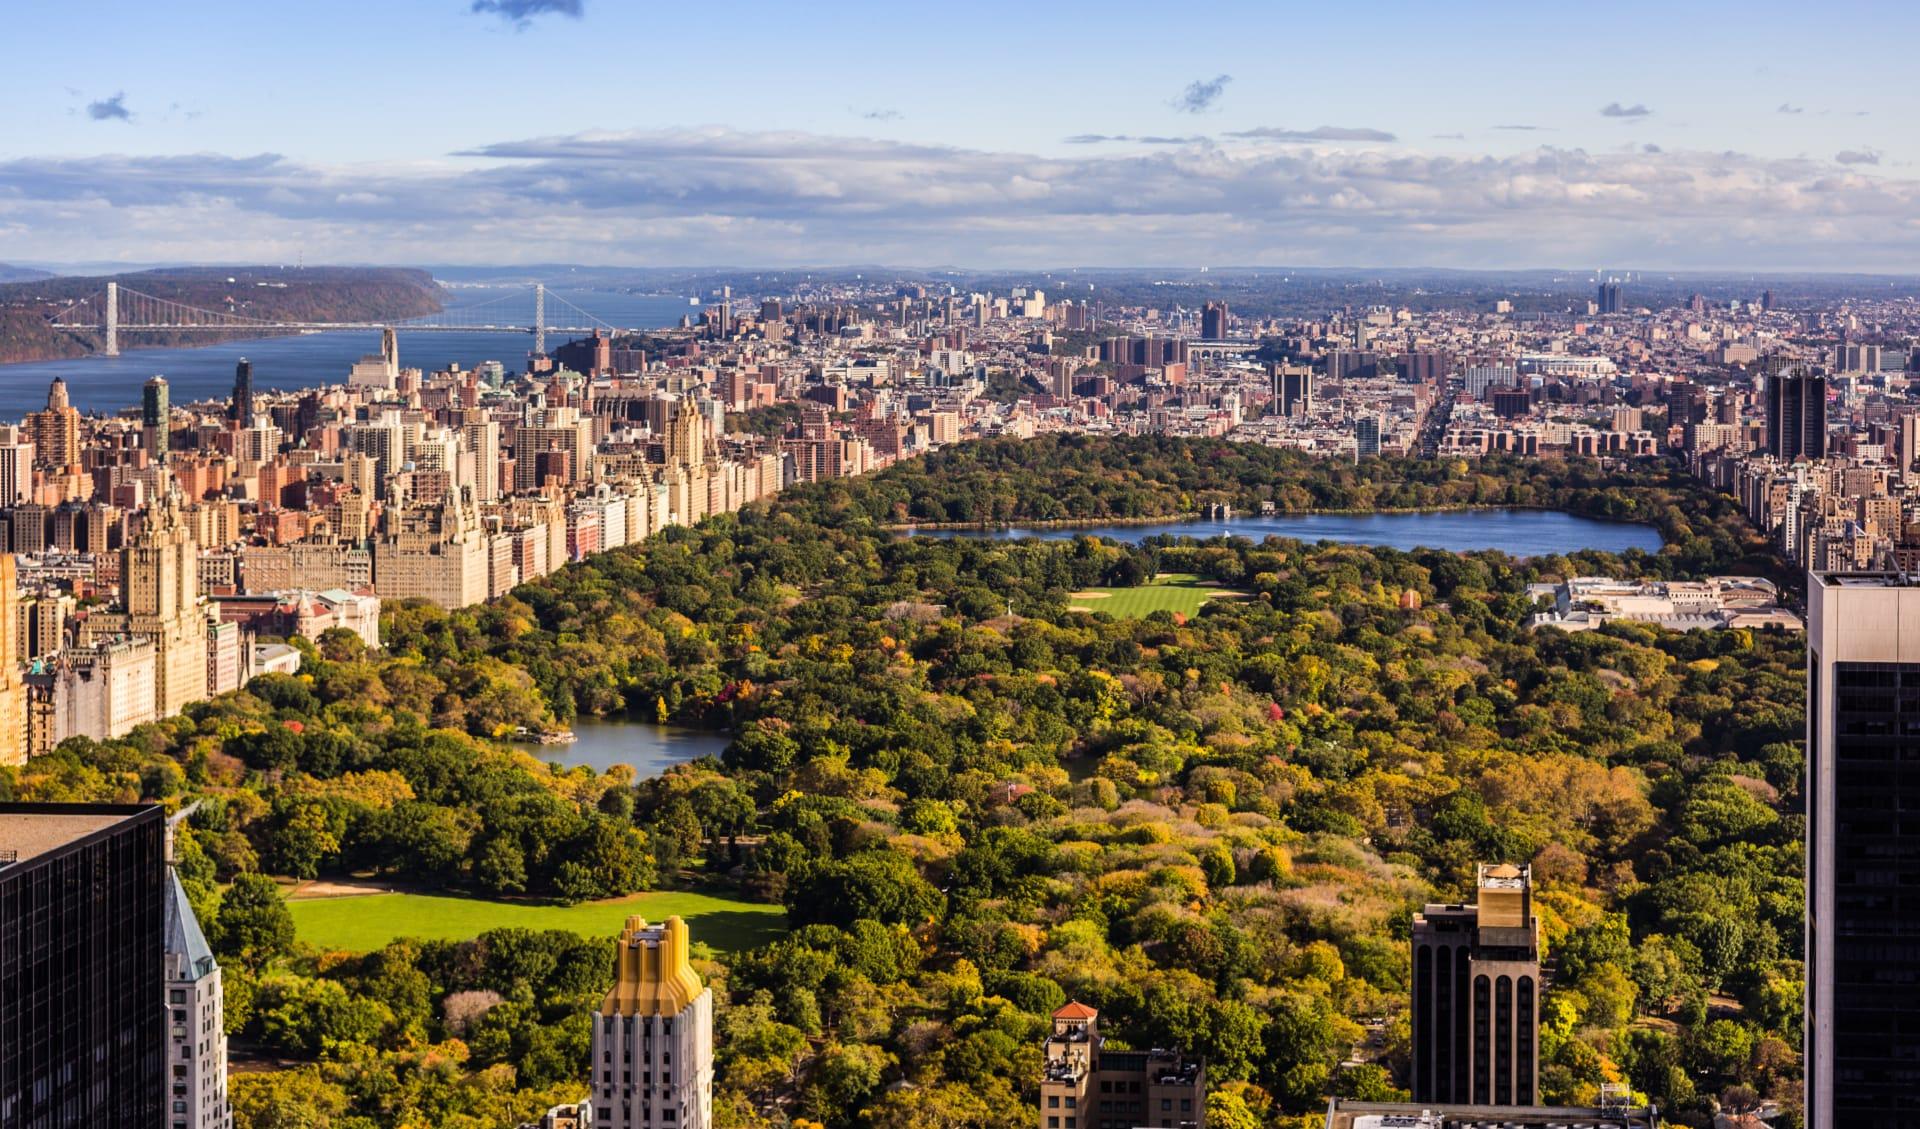 US Open ab New York - Manhattan: USA_New York_Central Park